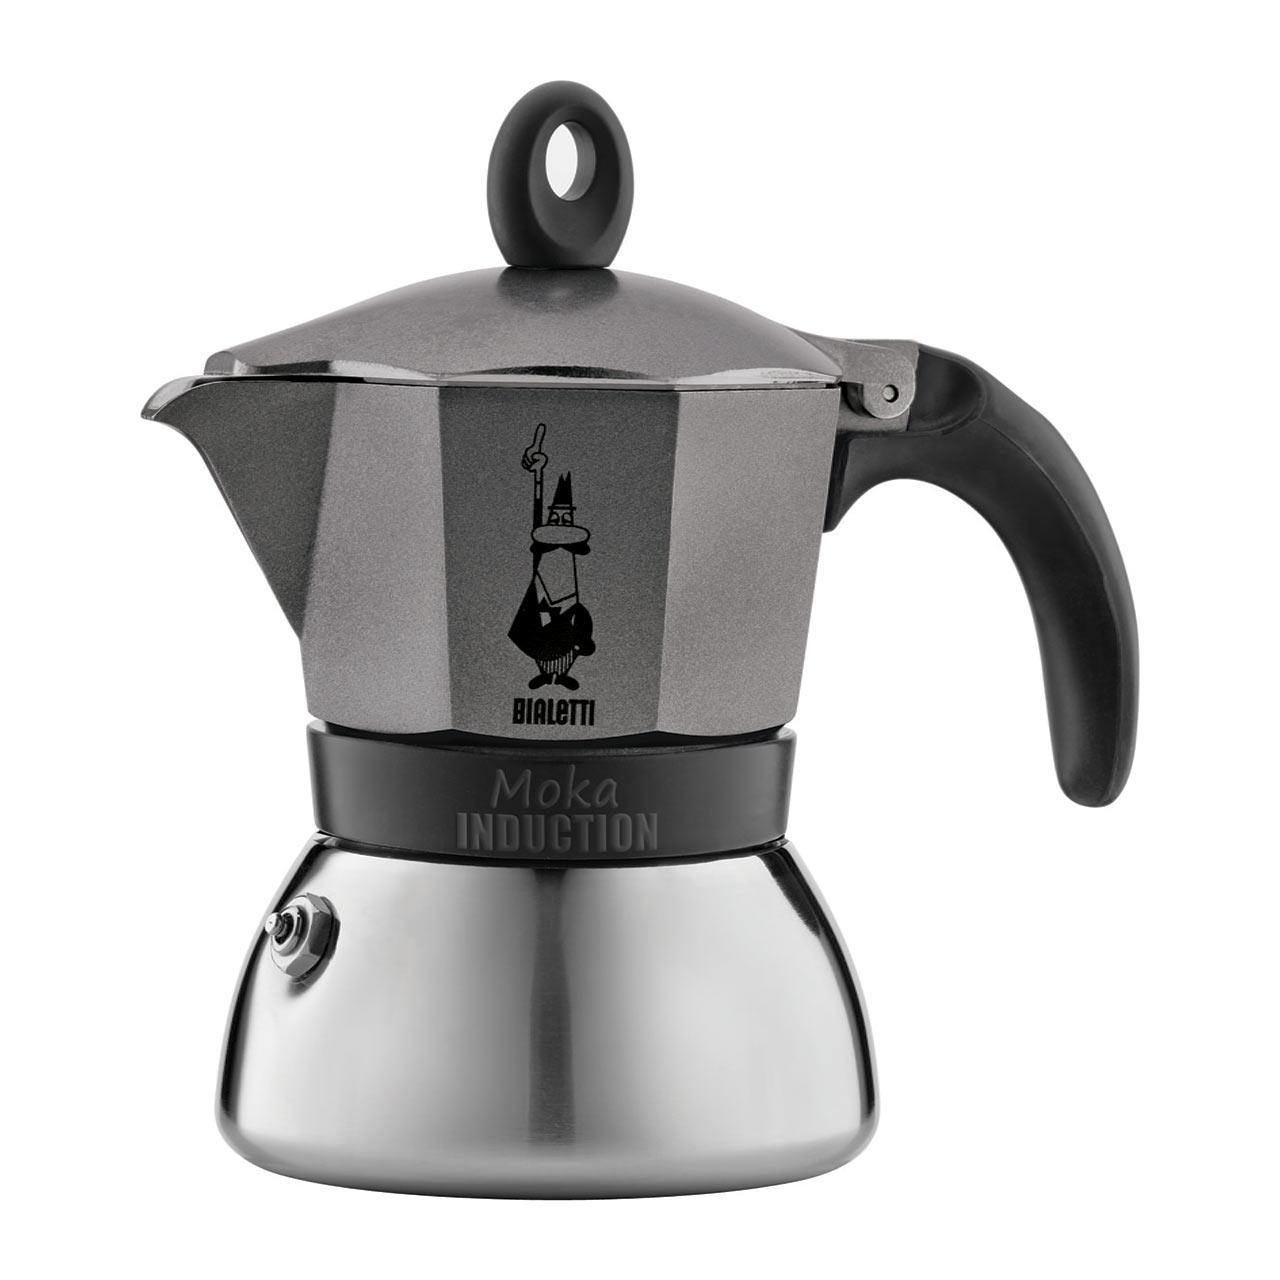 BIALETTI Moka Induction 3 Cup Espresso Coffee Maker | the design gift shop